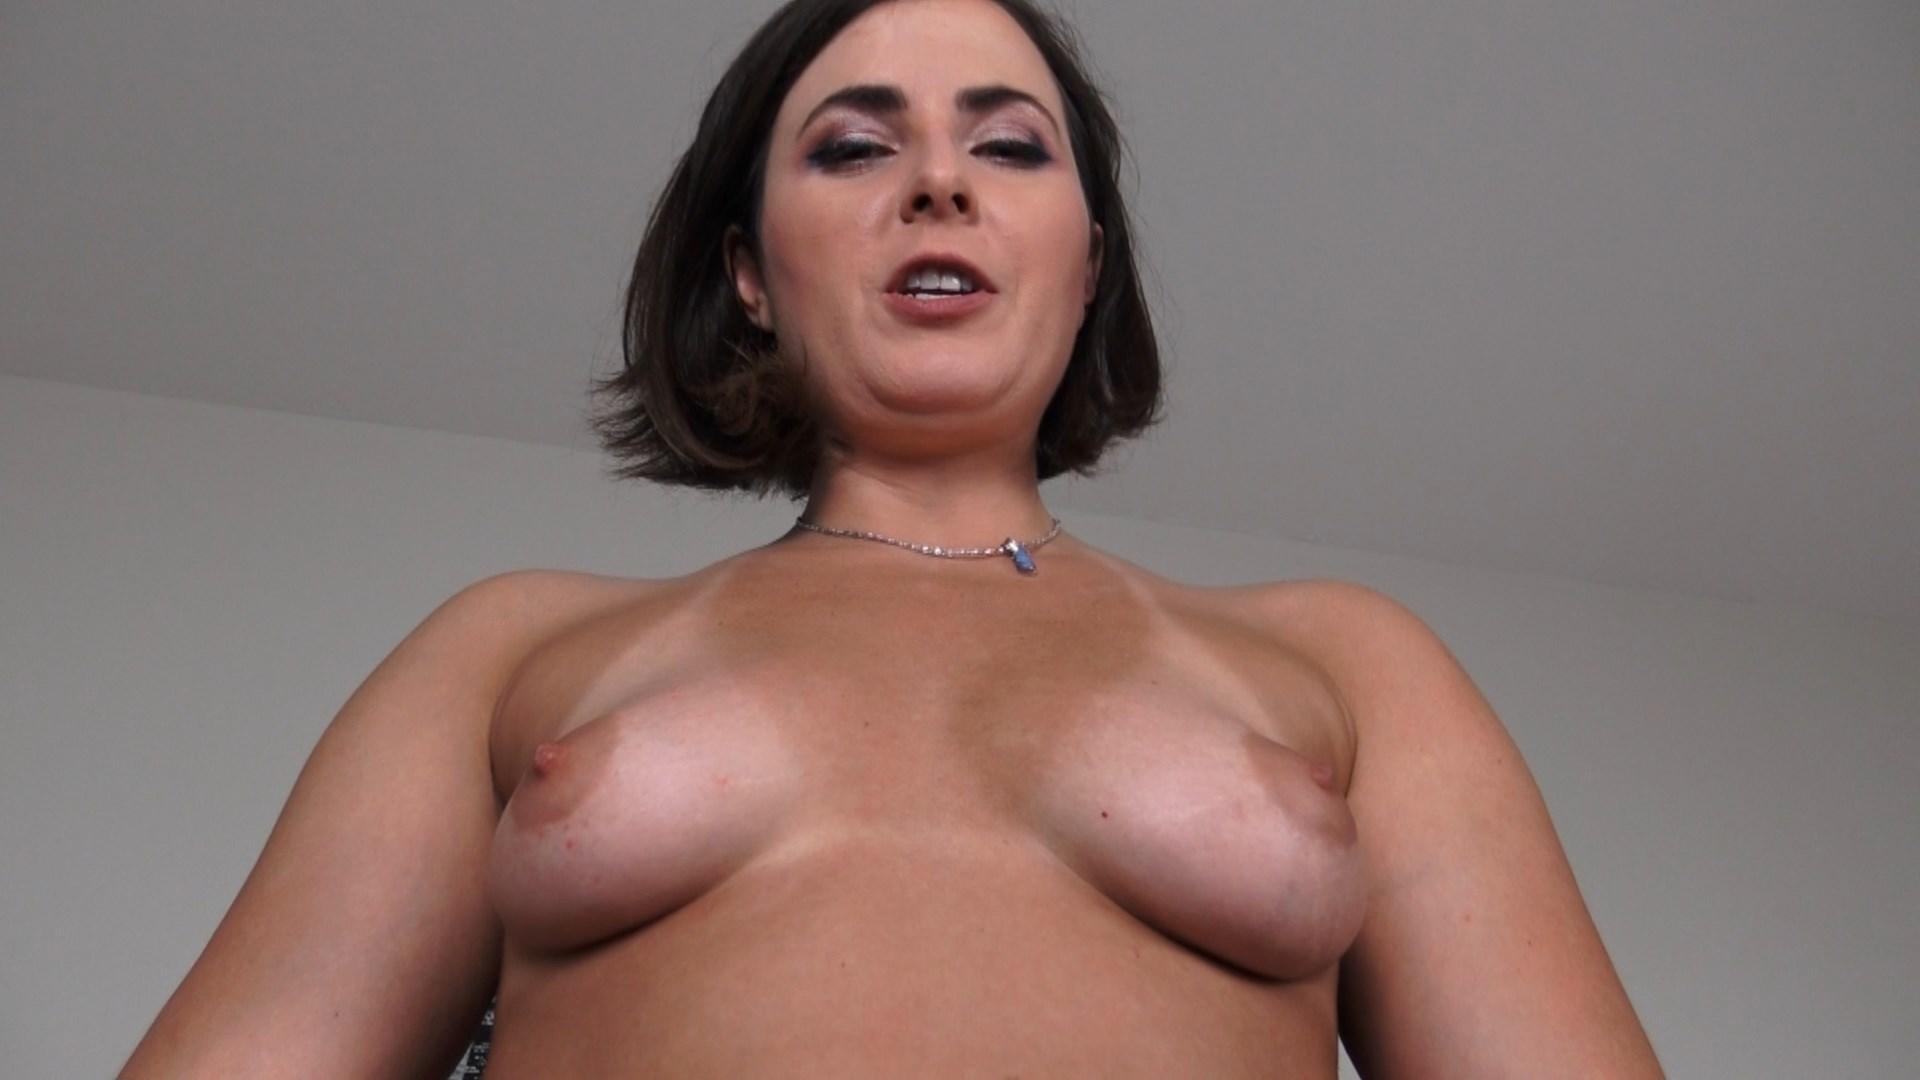 Helena Price - Hot Mom Fucks Virgin Son 1080p